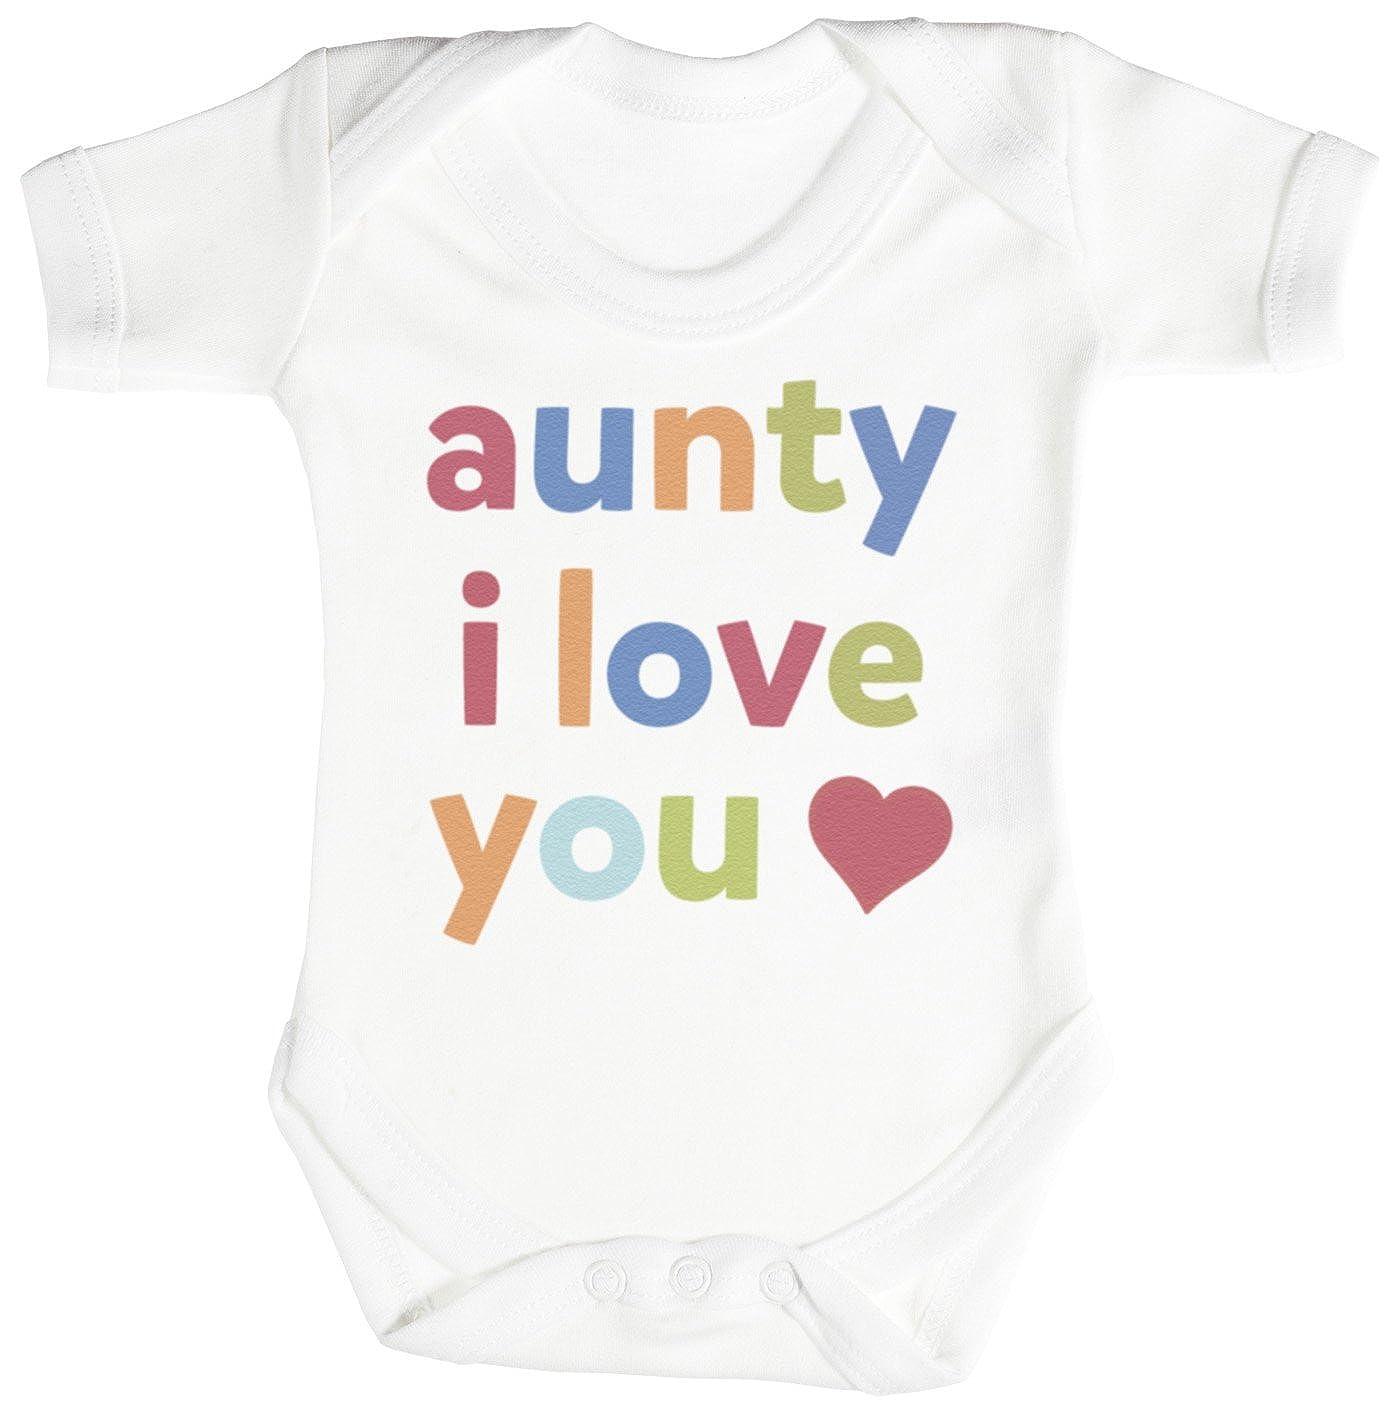 Cadeau B/éb/é Fille Cadeau B/éb/é Gar/çon Body B/éb/é Gar/çon Body B/éb/é Fille TRS Clothing Aunty I Love You Cadeau B/éb/é